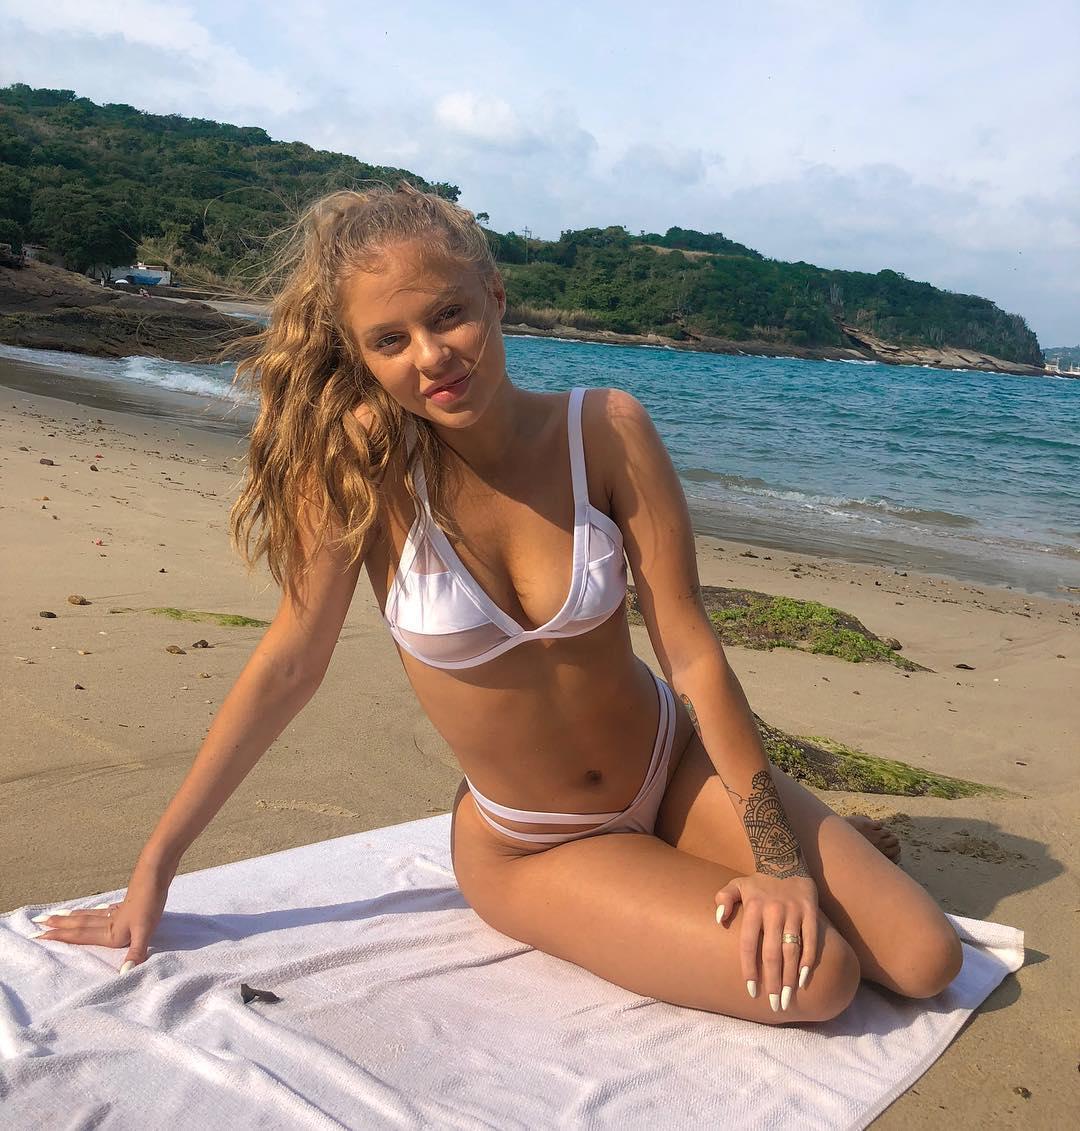 As fotos mais sexy de Luísa Sonza no Instagram 66